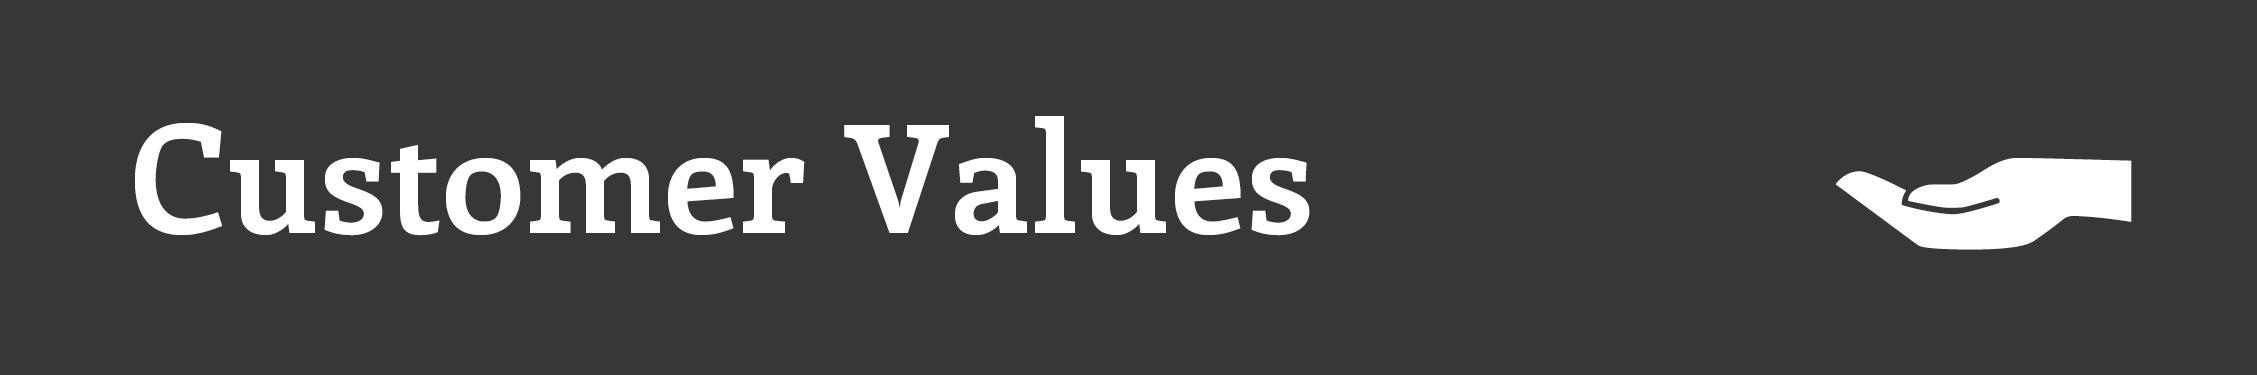 Customer Values